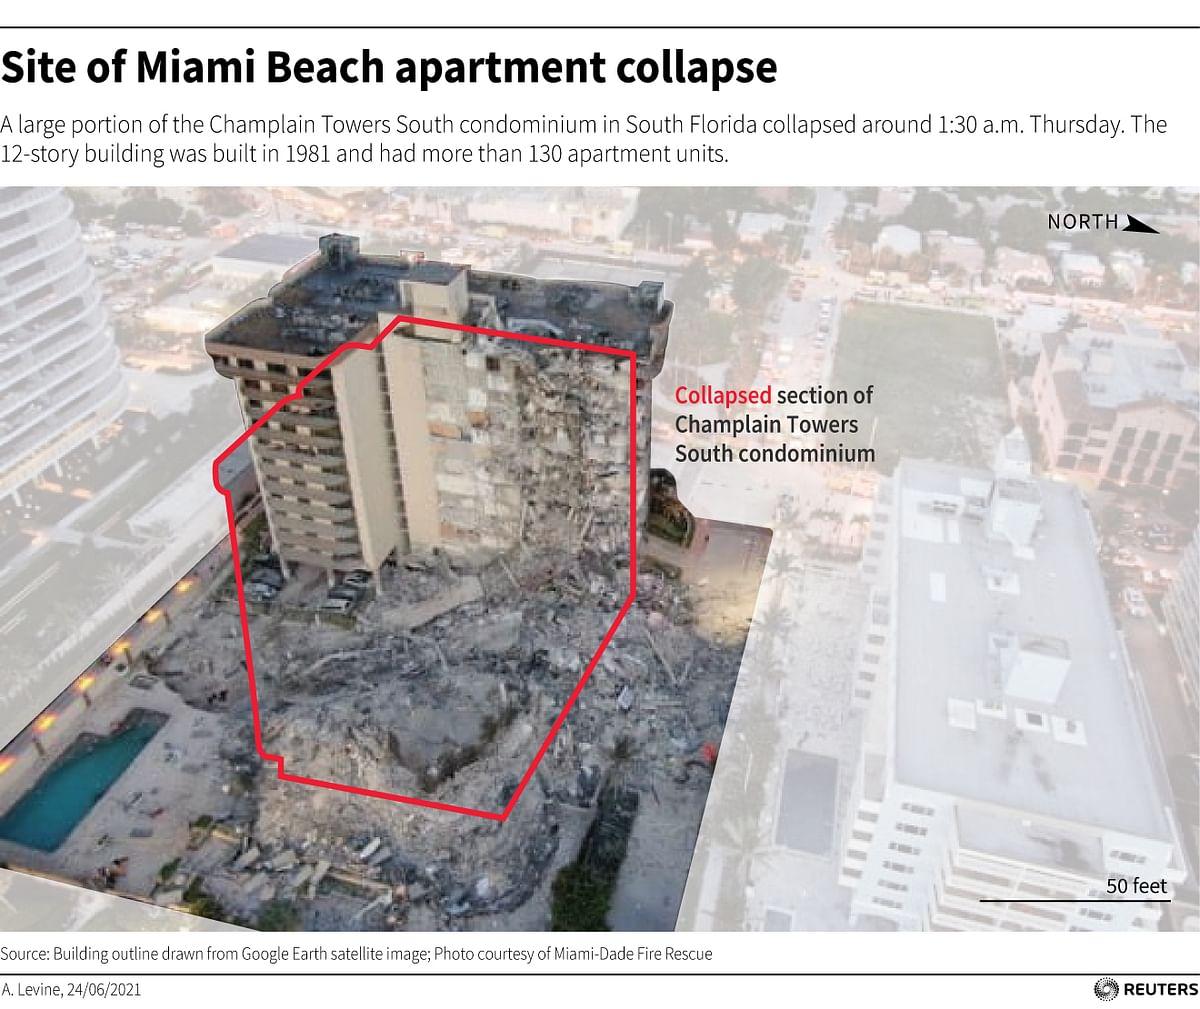 99 Missing as Condo Collapses near Miami Beach